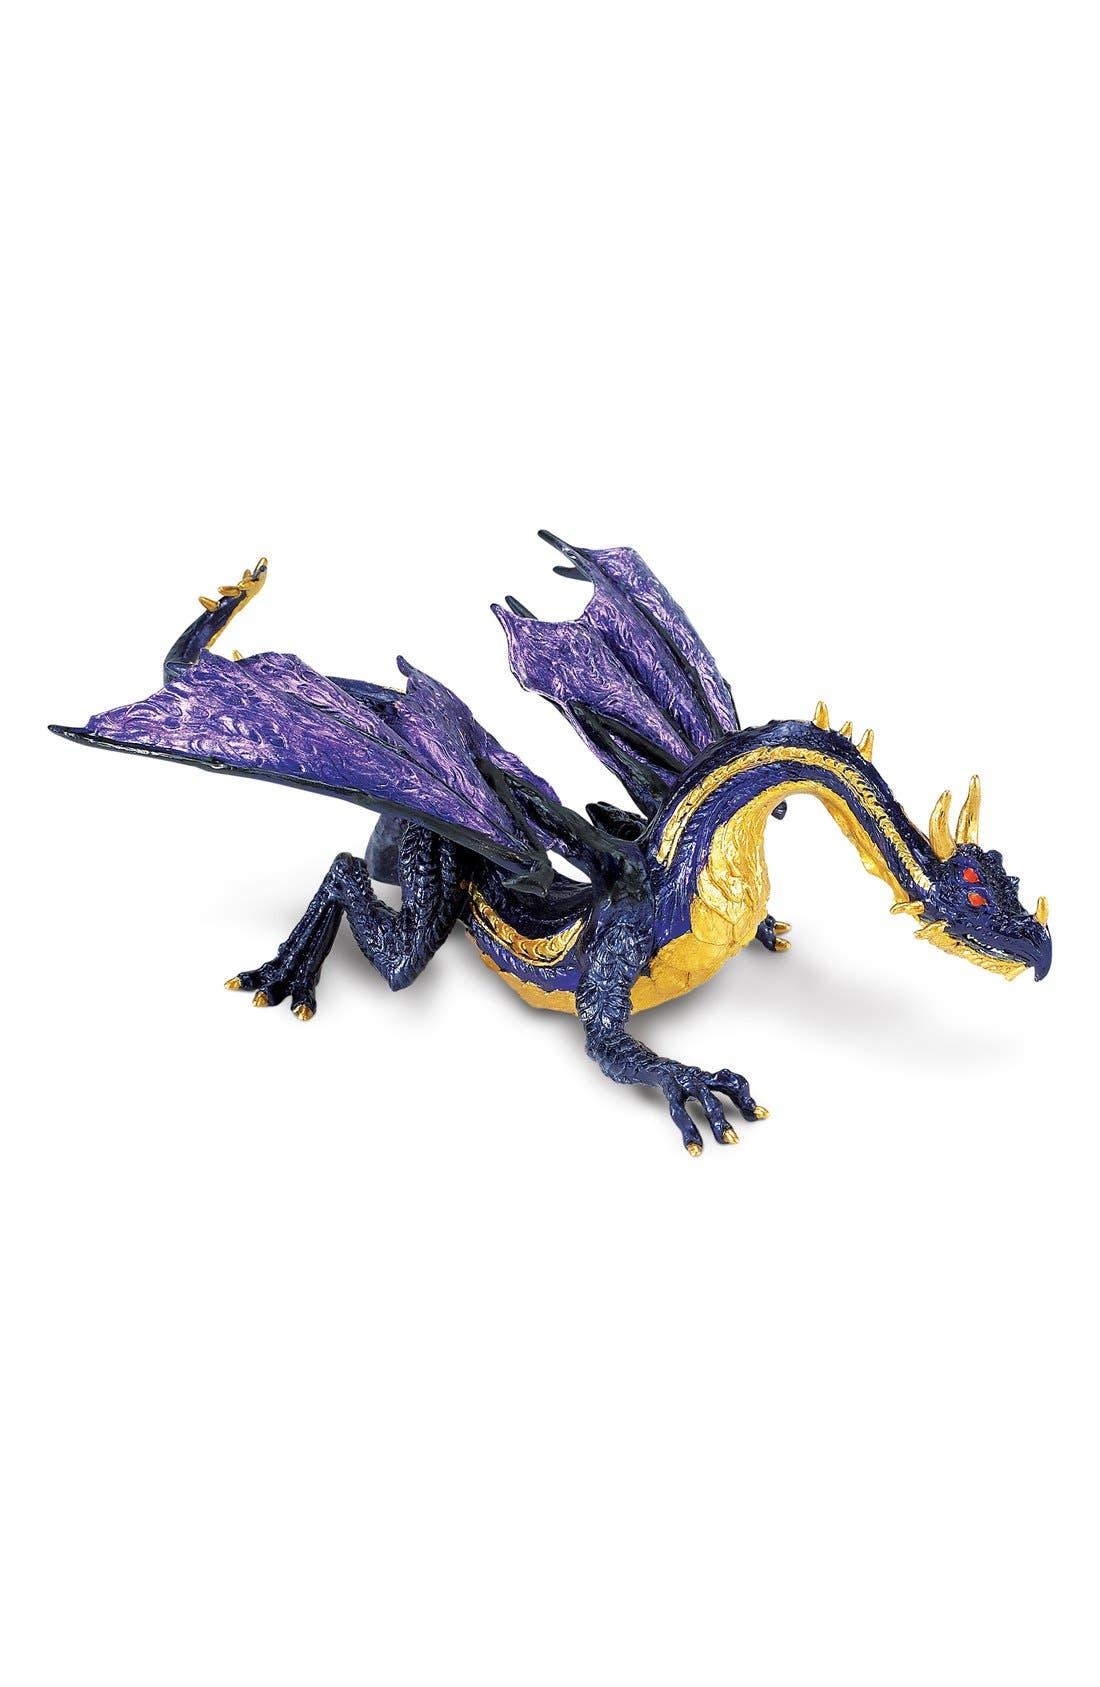 SAFARI LTD.,                             Midnight Moon Dragon Figurine,                             Main thumbnail 1, color,                             999